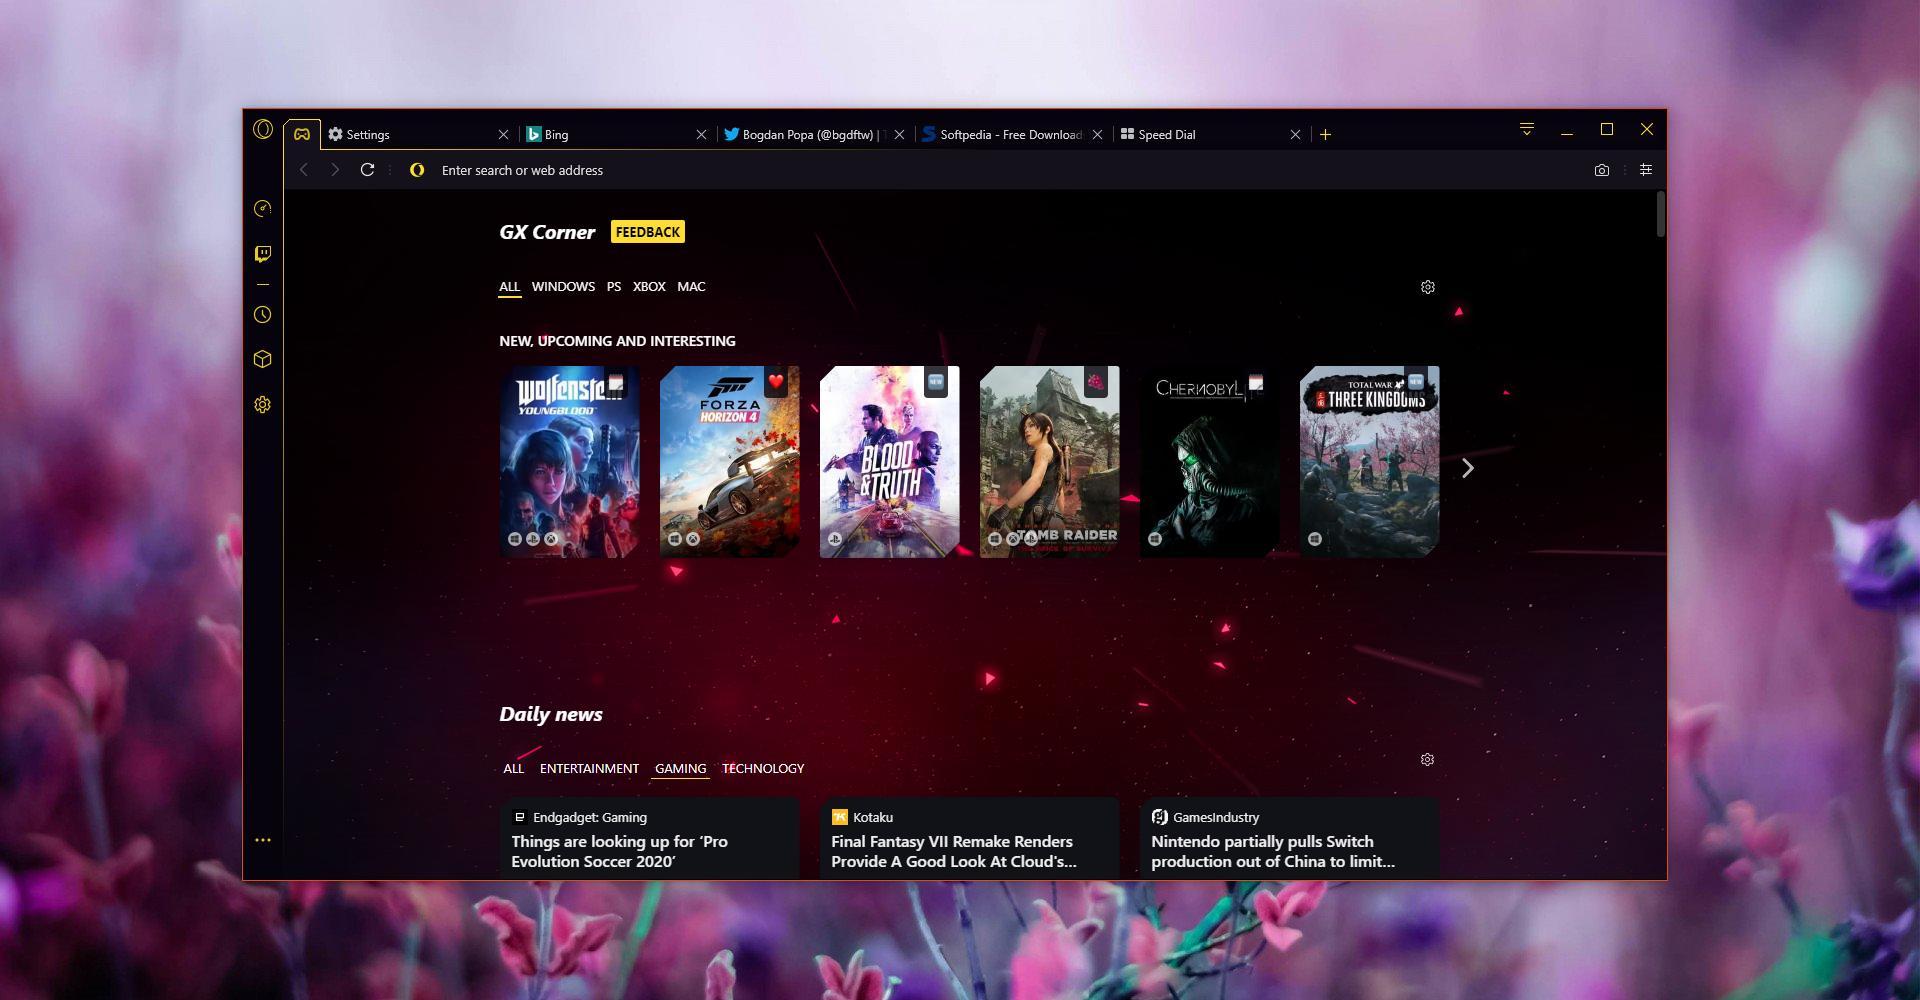 Opera GX: Tο πρώτο πρόγραμμα περιήγησης για gamers στον κόσμο Gettin15